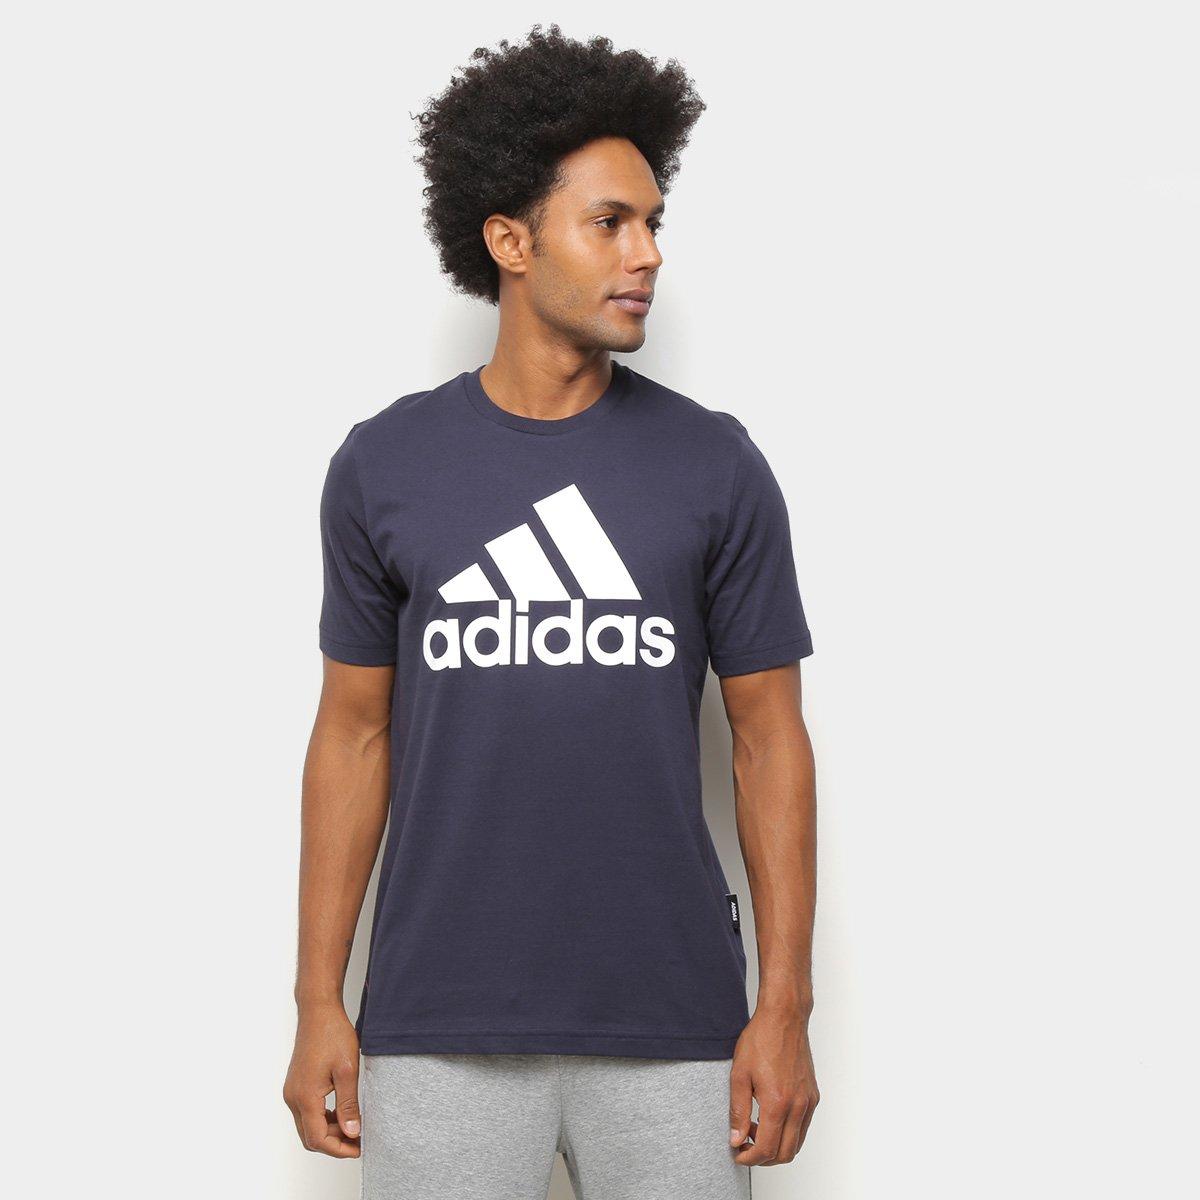 adidas camiseta - Camiseta Adidas Must Haves Badge Of Sport Masculina - R$ 54,99